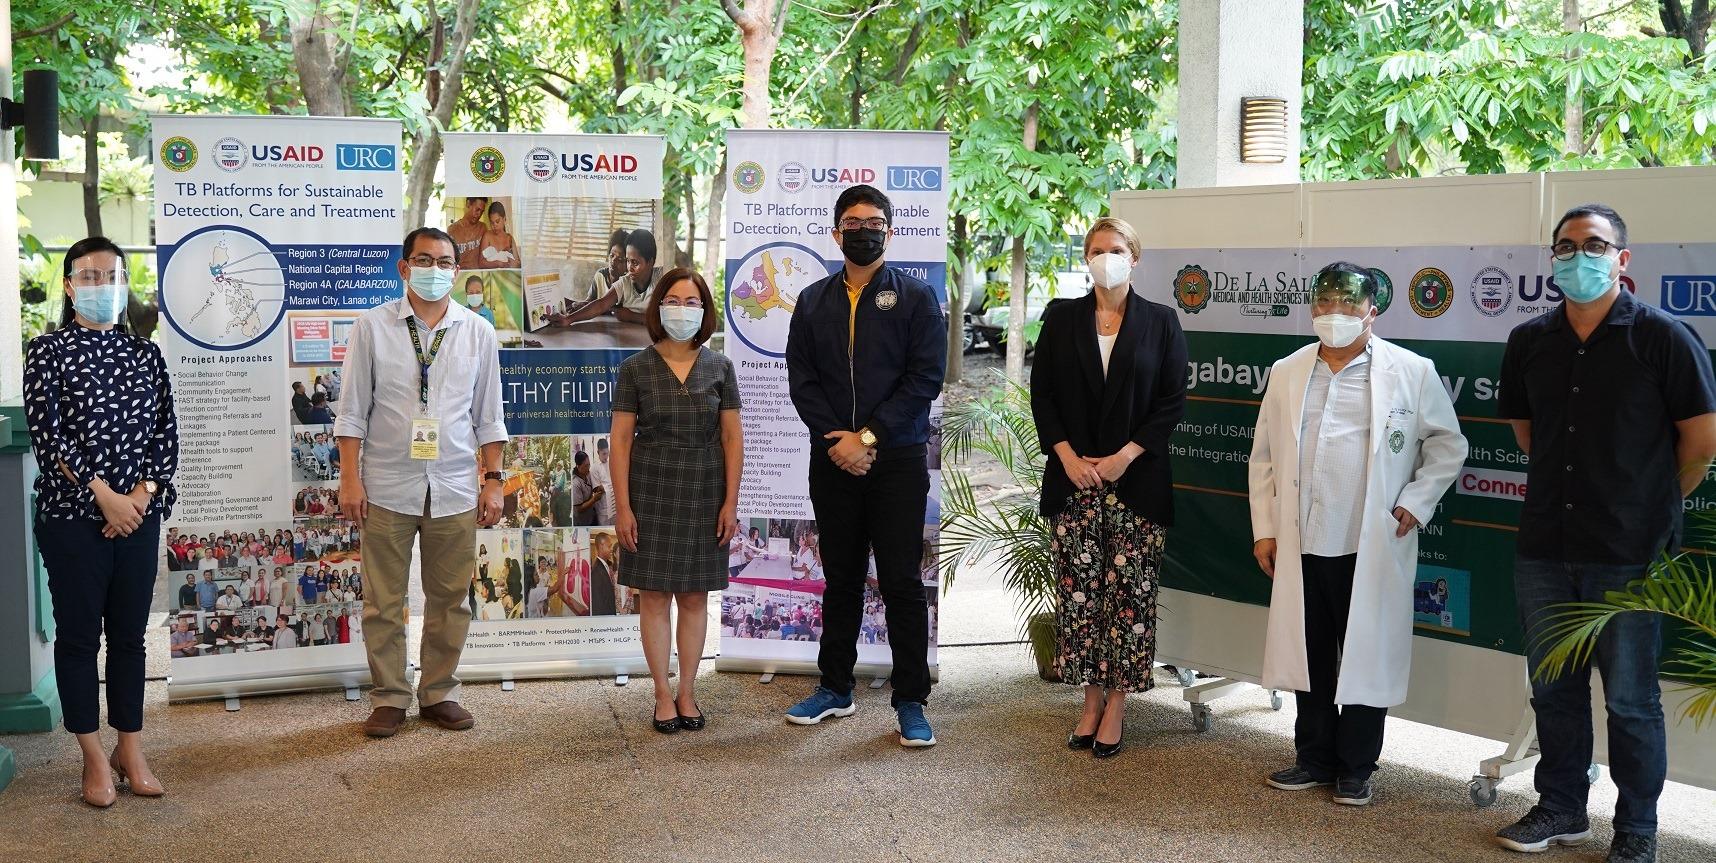 ConnecTB helps kagabay monitor TB treatment adherence